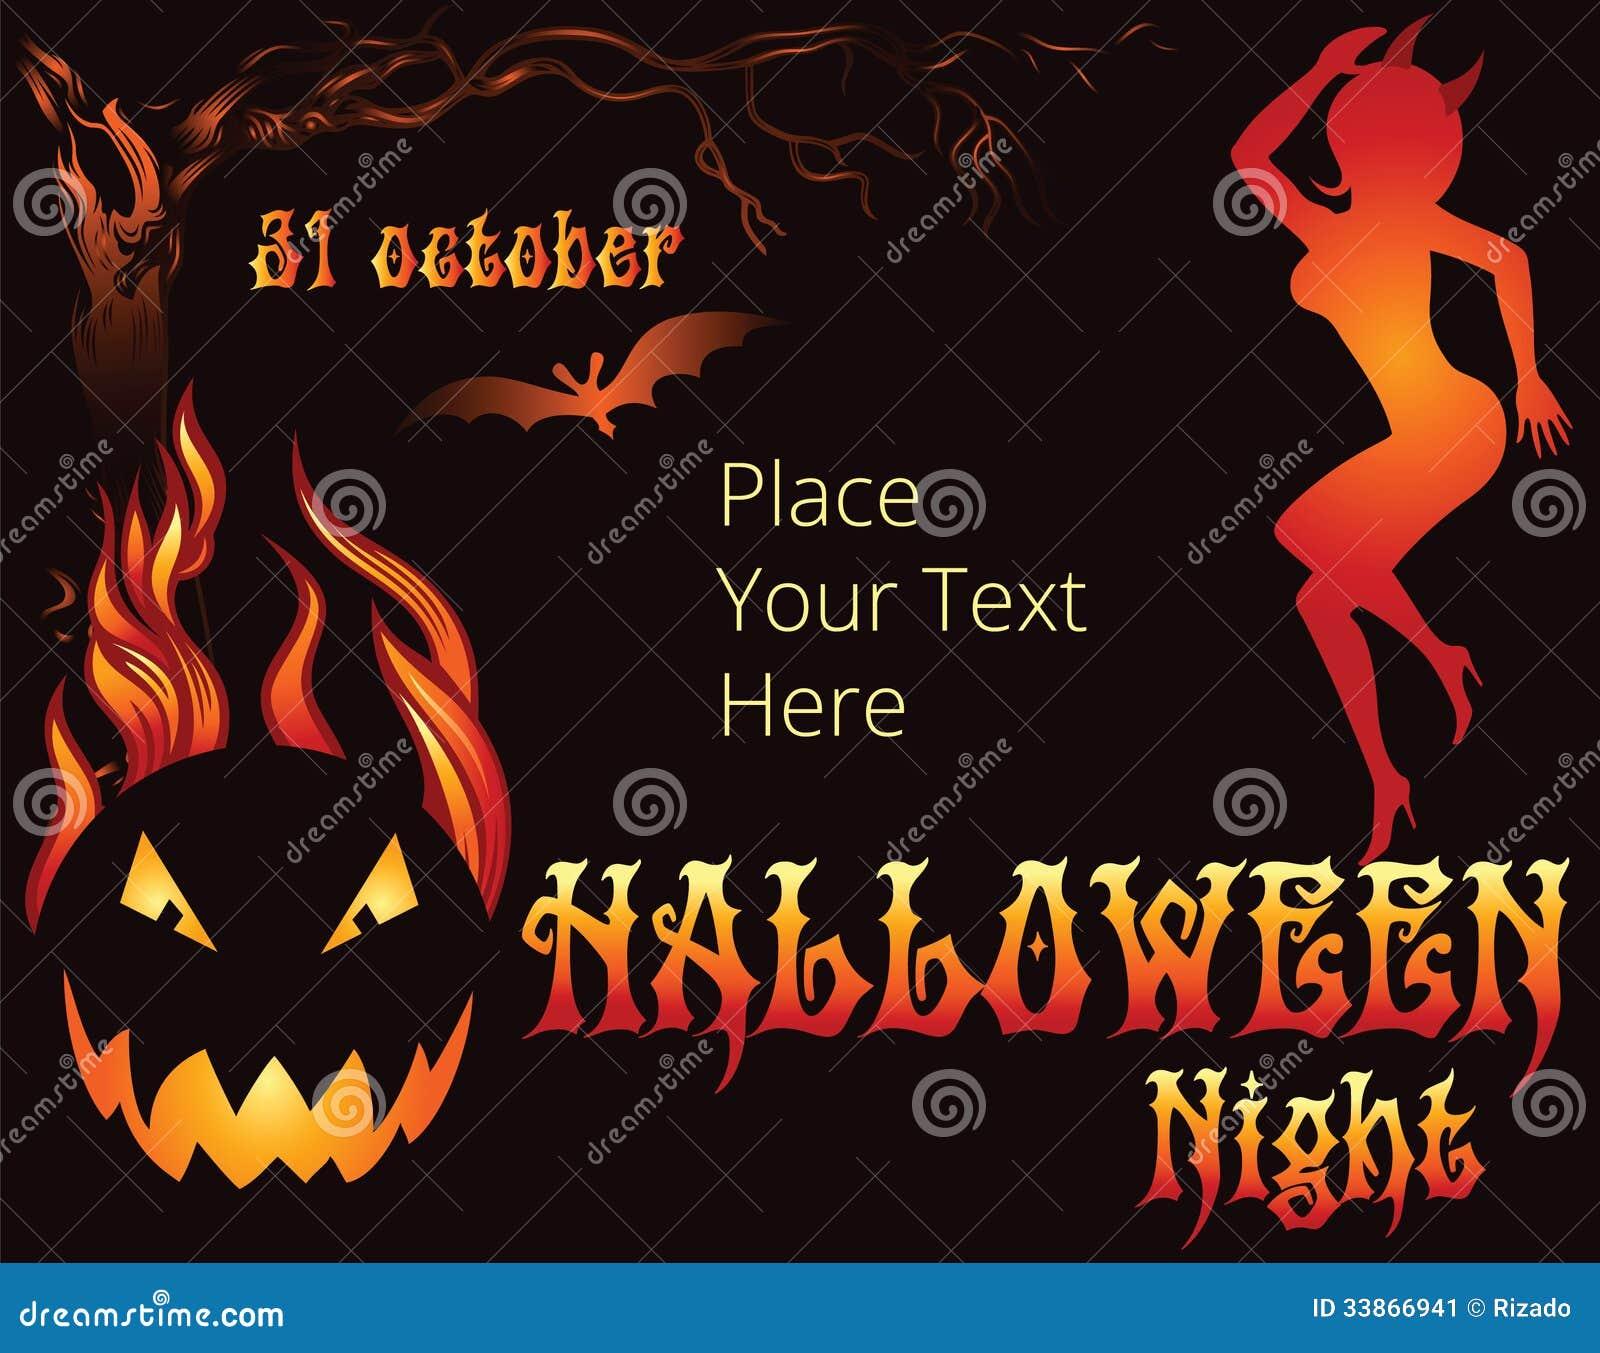 Halloween Party Template. halloween invitation 35 free psd vector ...